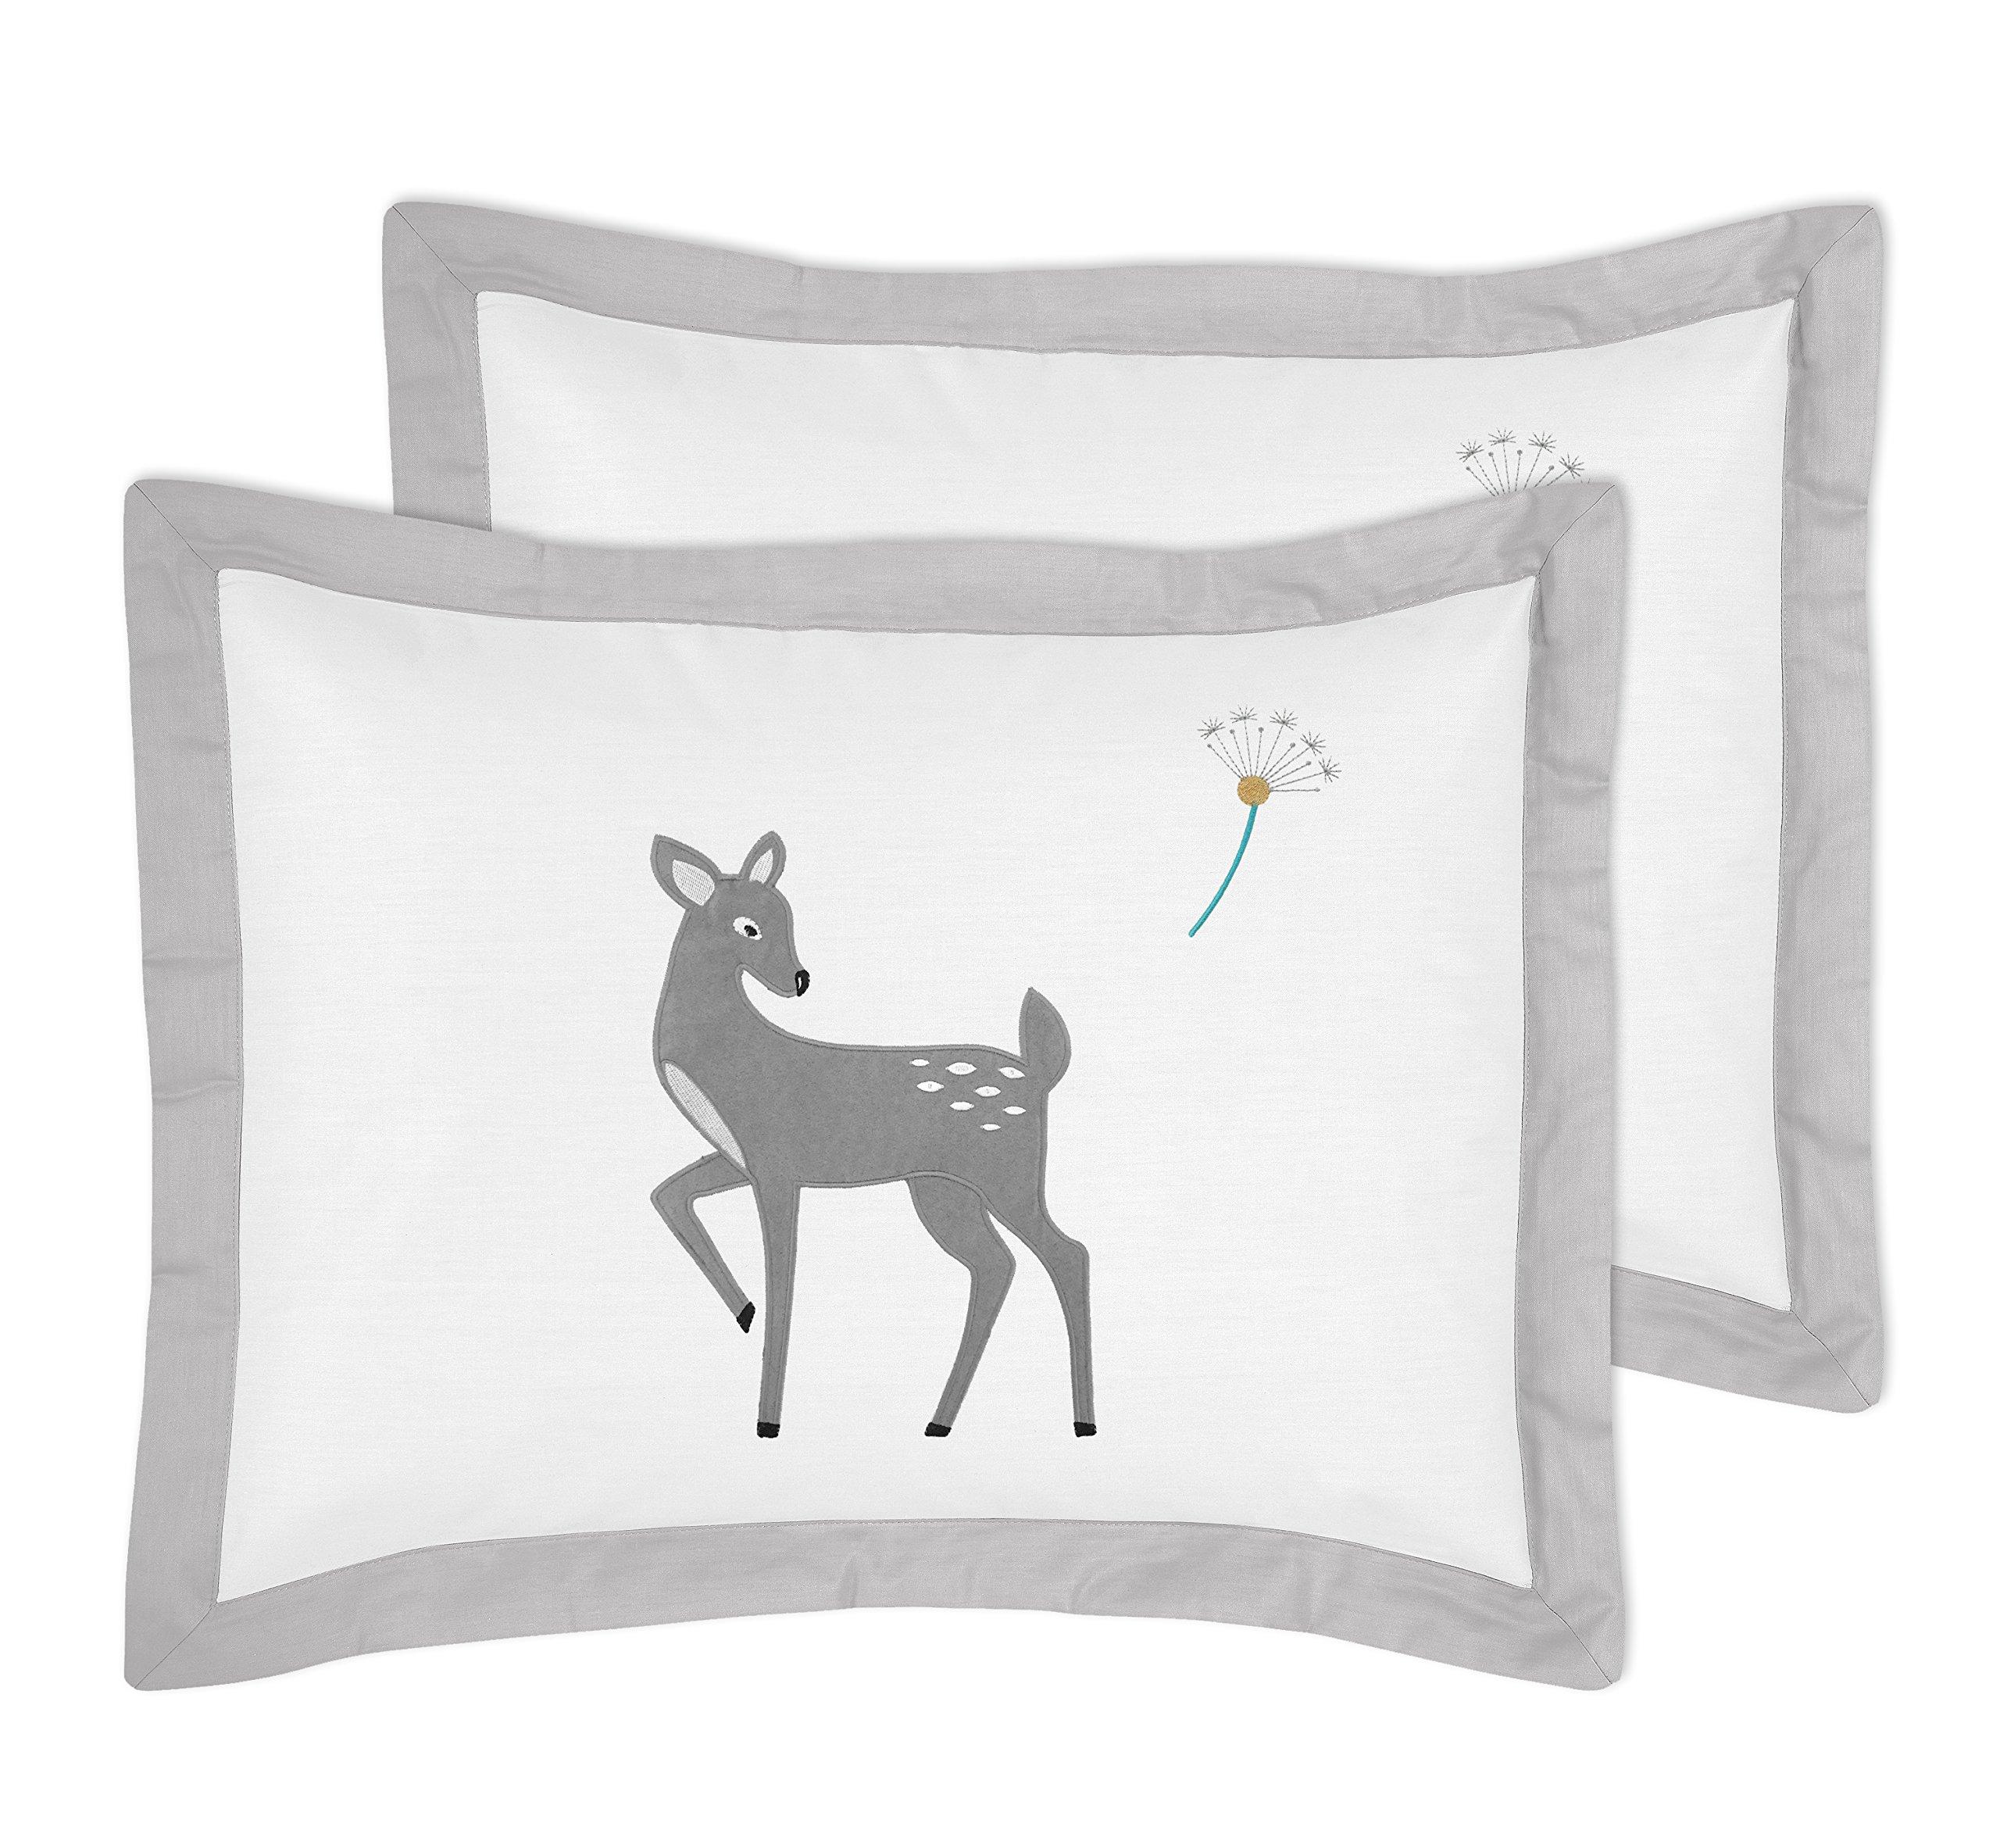 Sweet Jojo Designs 3-Piece Grey Gold and White Forest Deer and Dandelion Girl or Boy Full/Queen Bedding Children's Bedding Set by Sweet Jojo Designs (Image #2)